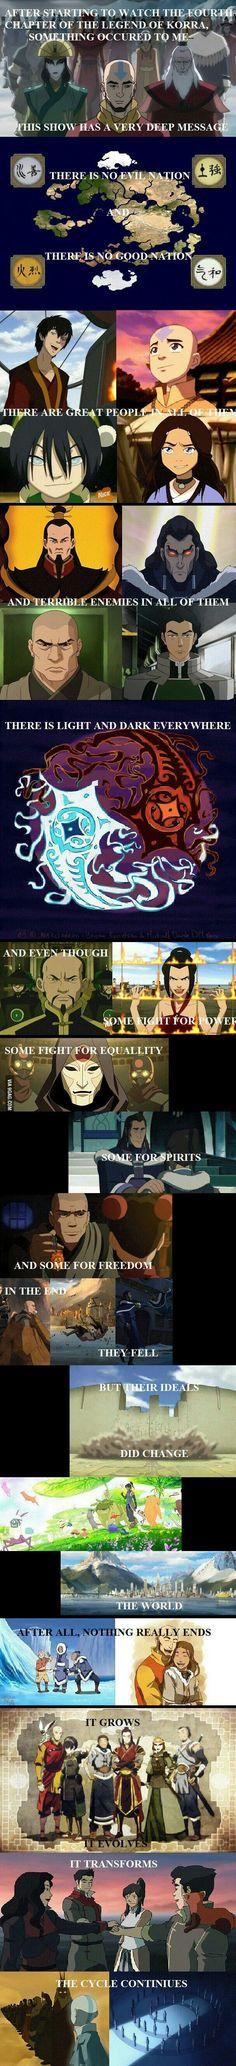 The things I learned from avatar the legend of Aang and Korra Avatar Aang, Avatar The Last Airbender Art, Team Avatar, Avatar Funny, Zuko, Legend Of Aang, Dark Fantasy, Avatar Series, Korrasami